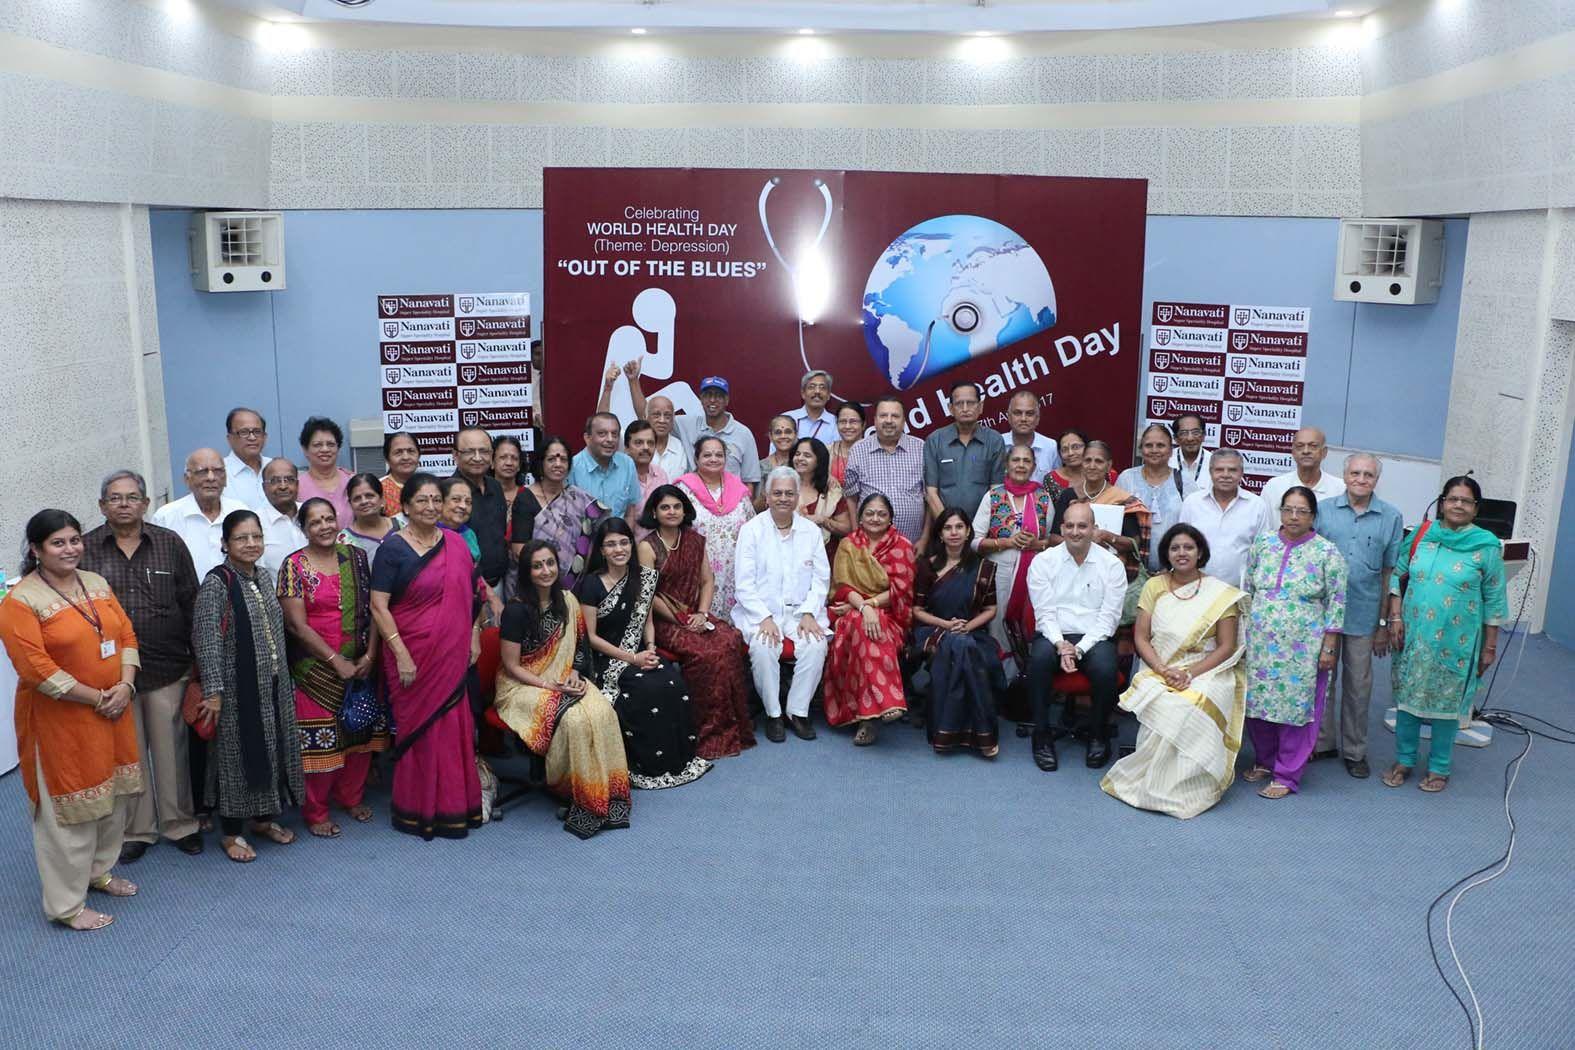 Pin on World Health Day Celebration